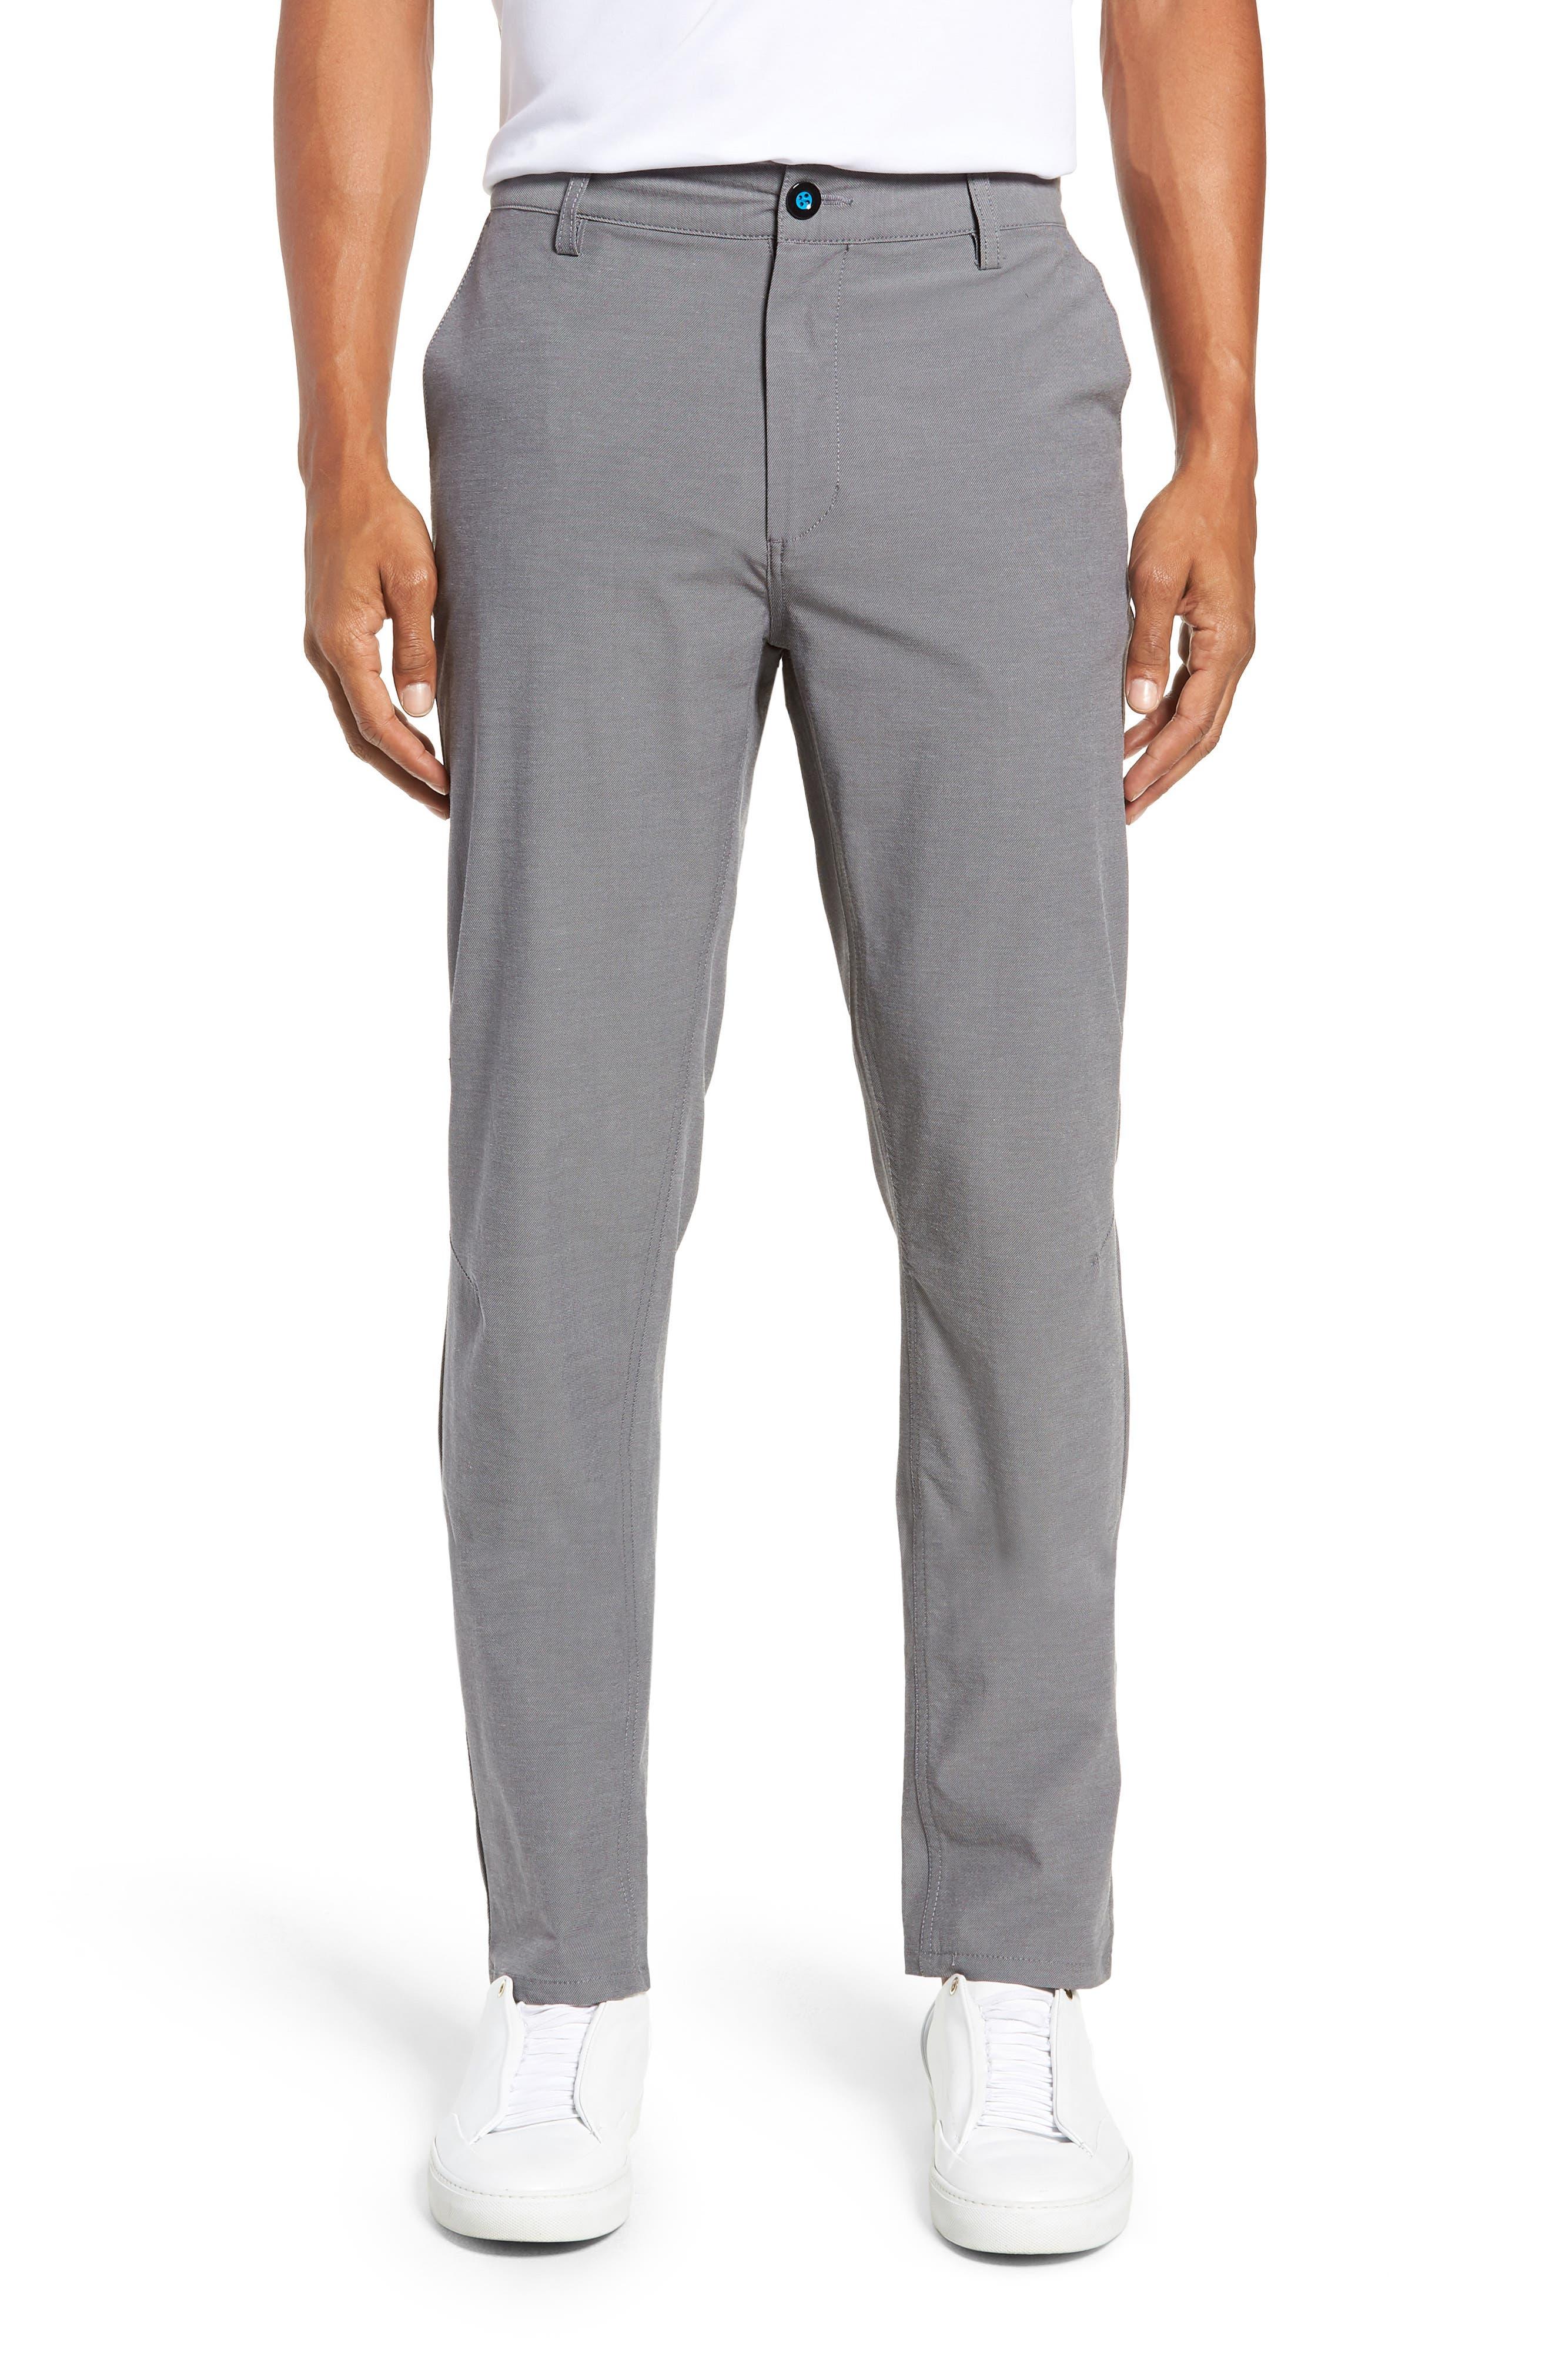 Passport Regular Fit Pants,                         Main,                         color, GRAPHITE